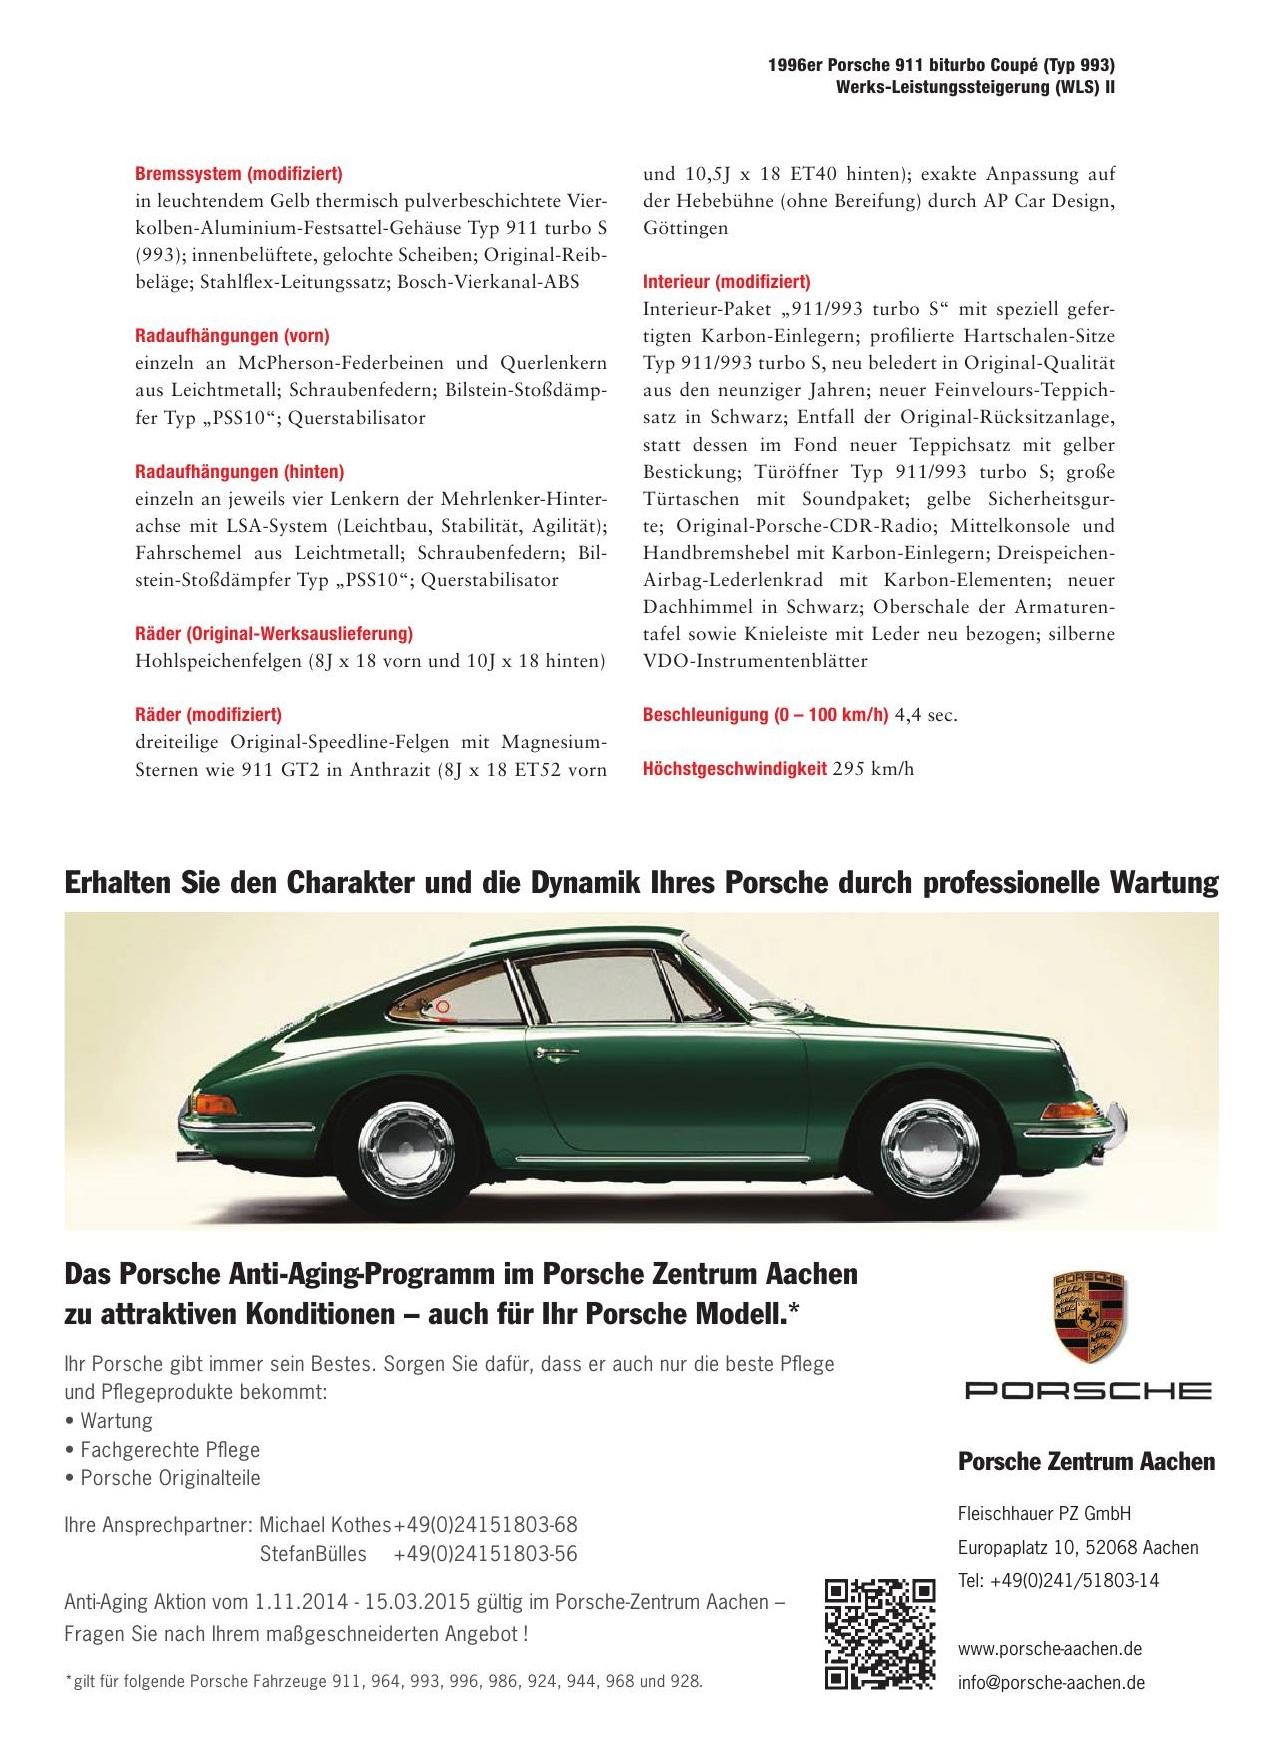 porsche 993 turbo s deutsch porsche cars history. Black Bedroom Furniture Sets. Home Design Ideas